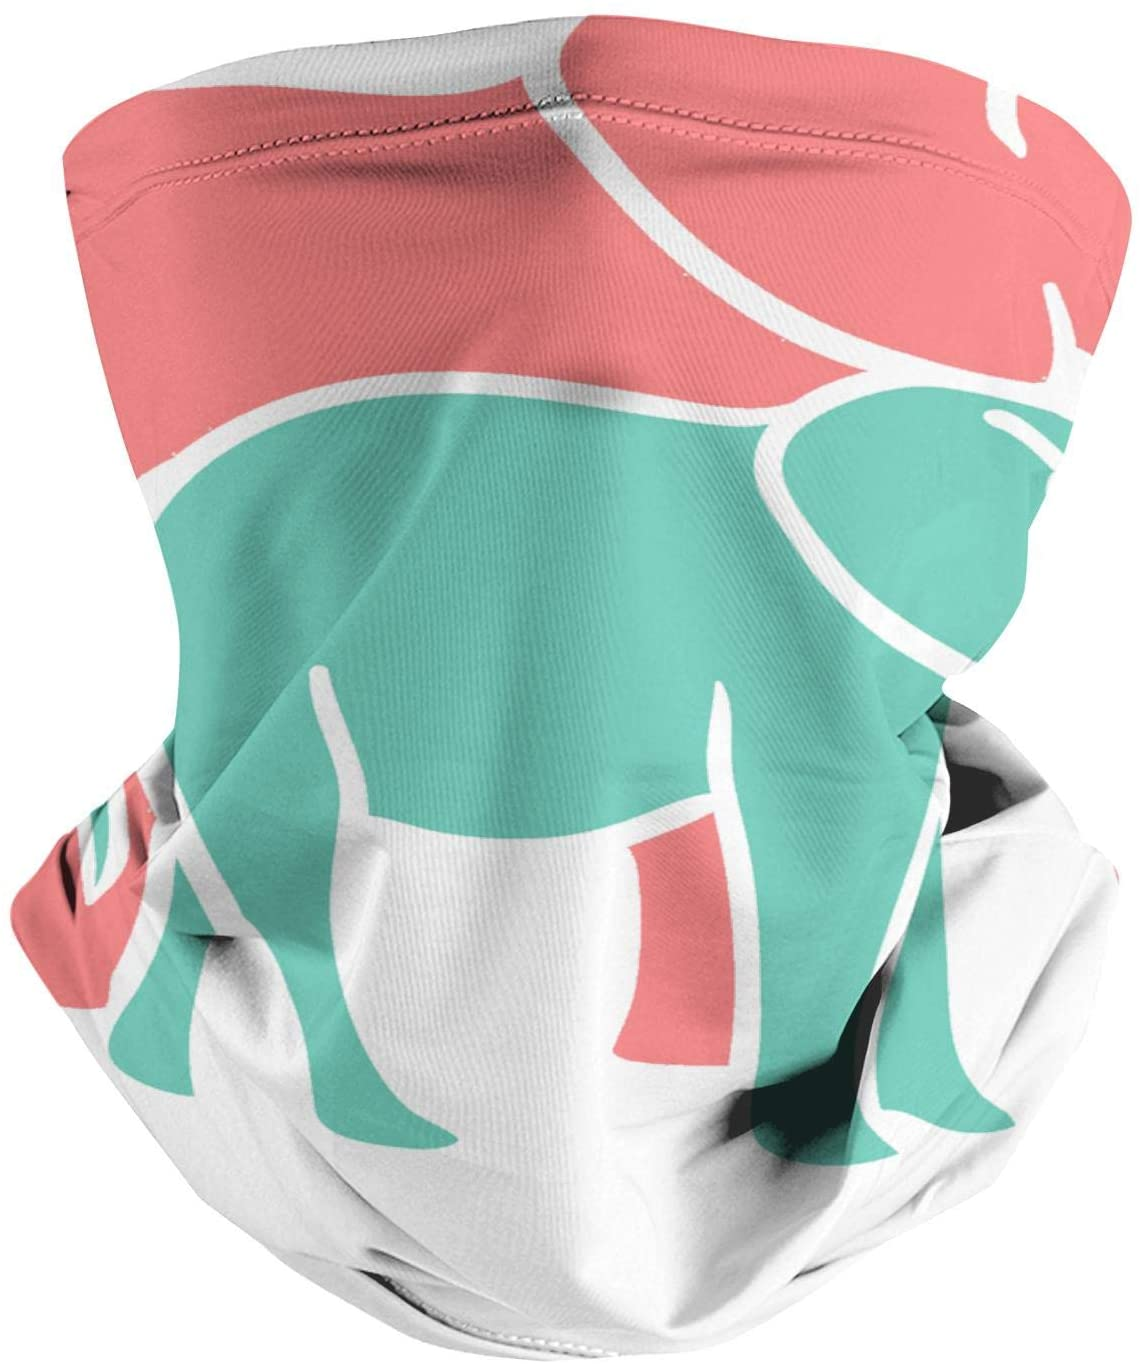 LHSCVUFASC Elephant Shape Ornament Dust Neck Face Cover Bandanas Scarf Cover Gaiter Fishing Protection Headband